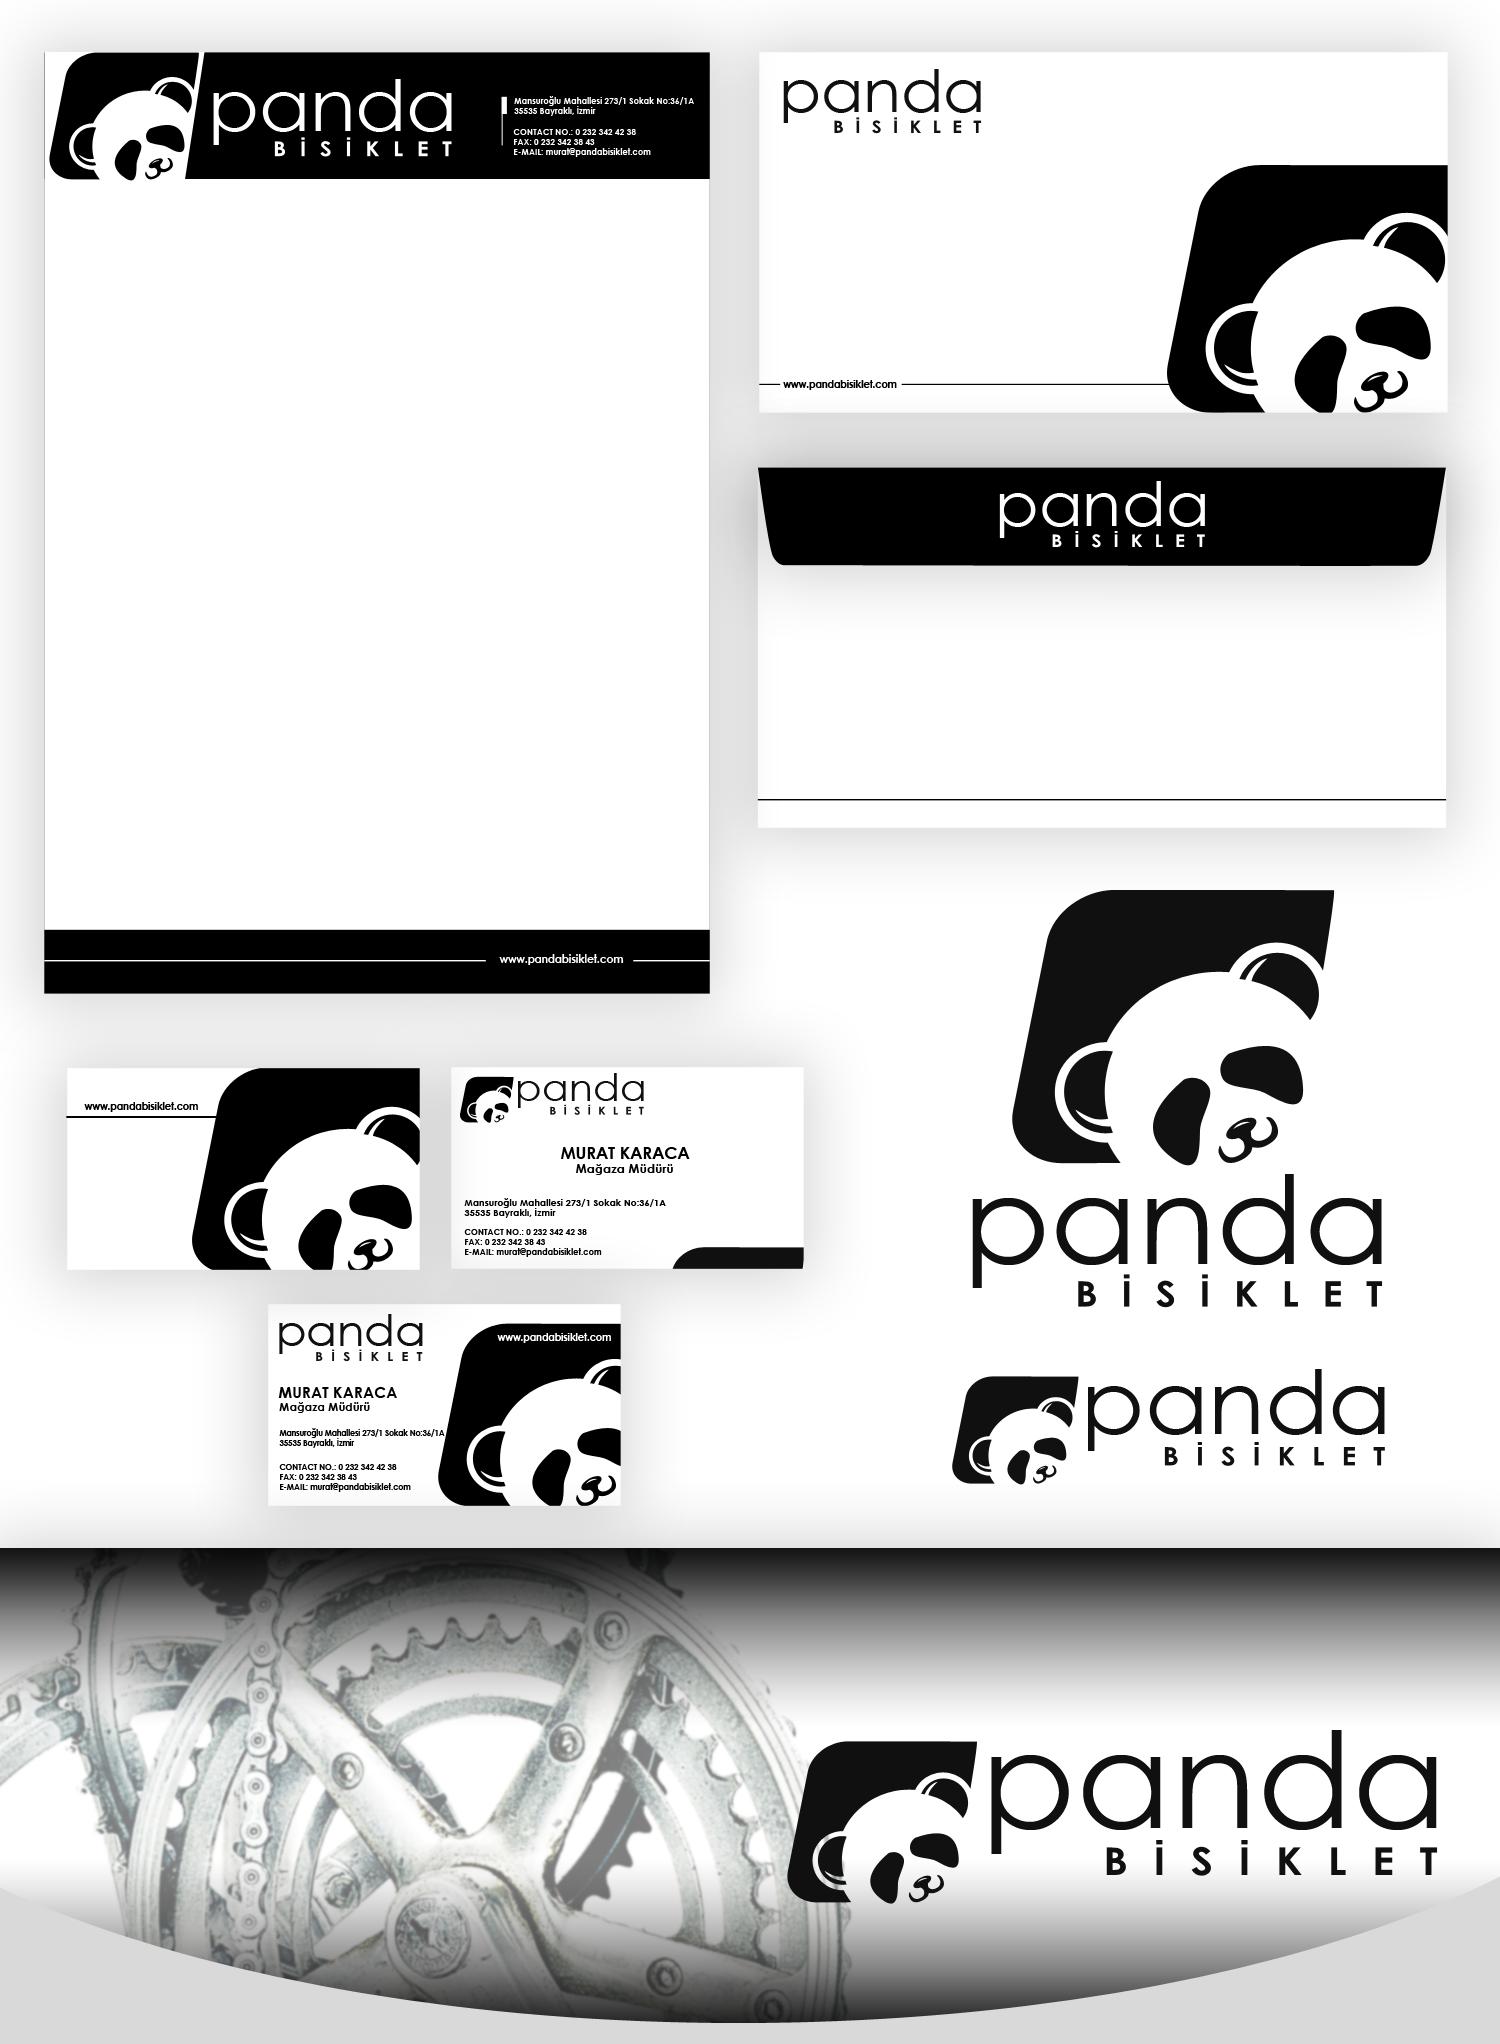 Panda Bike is looking for its logo